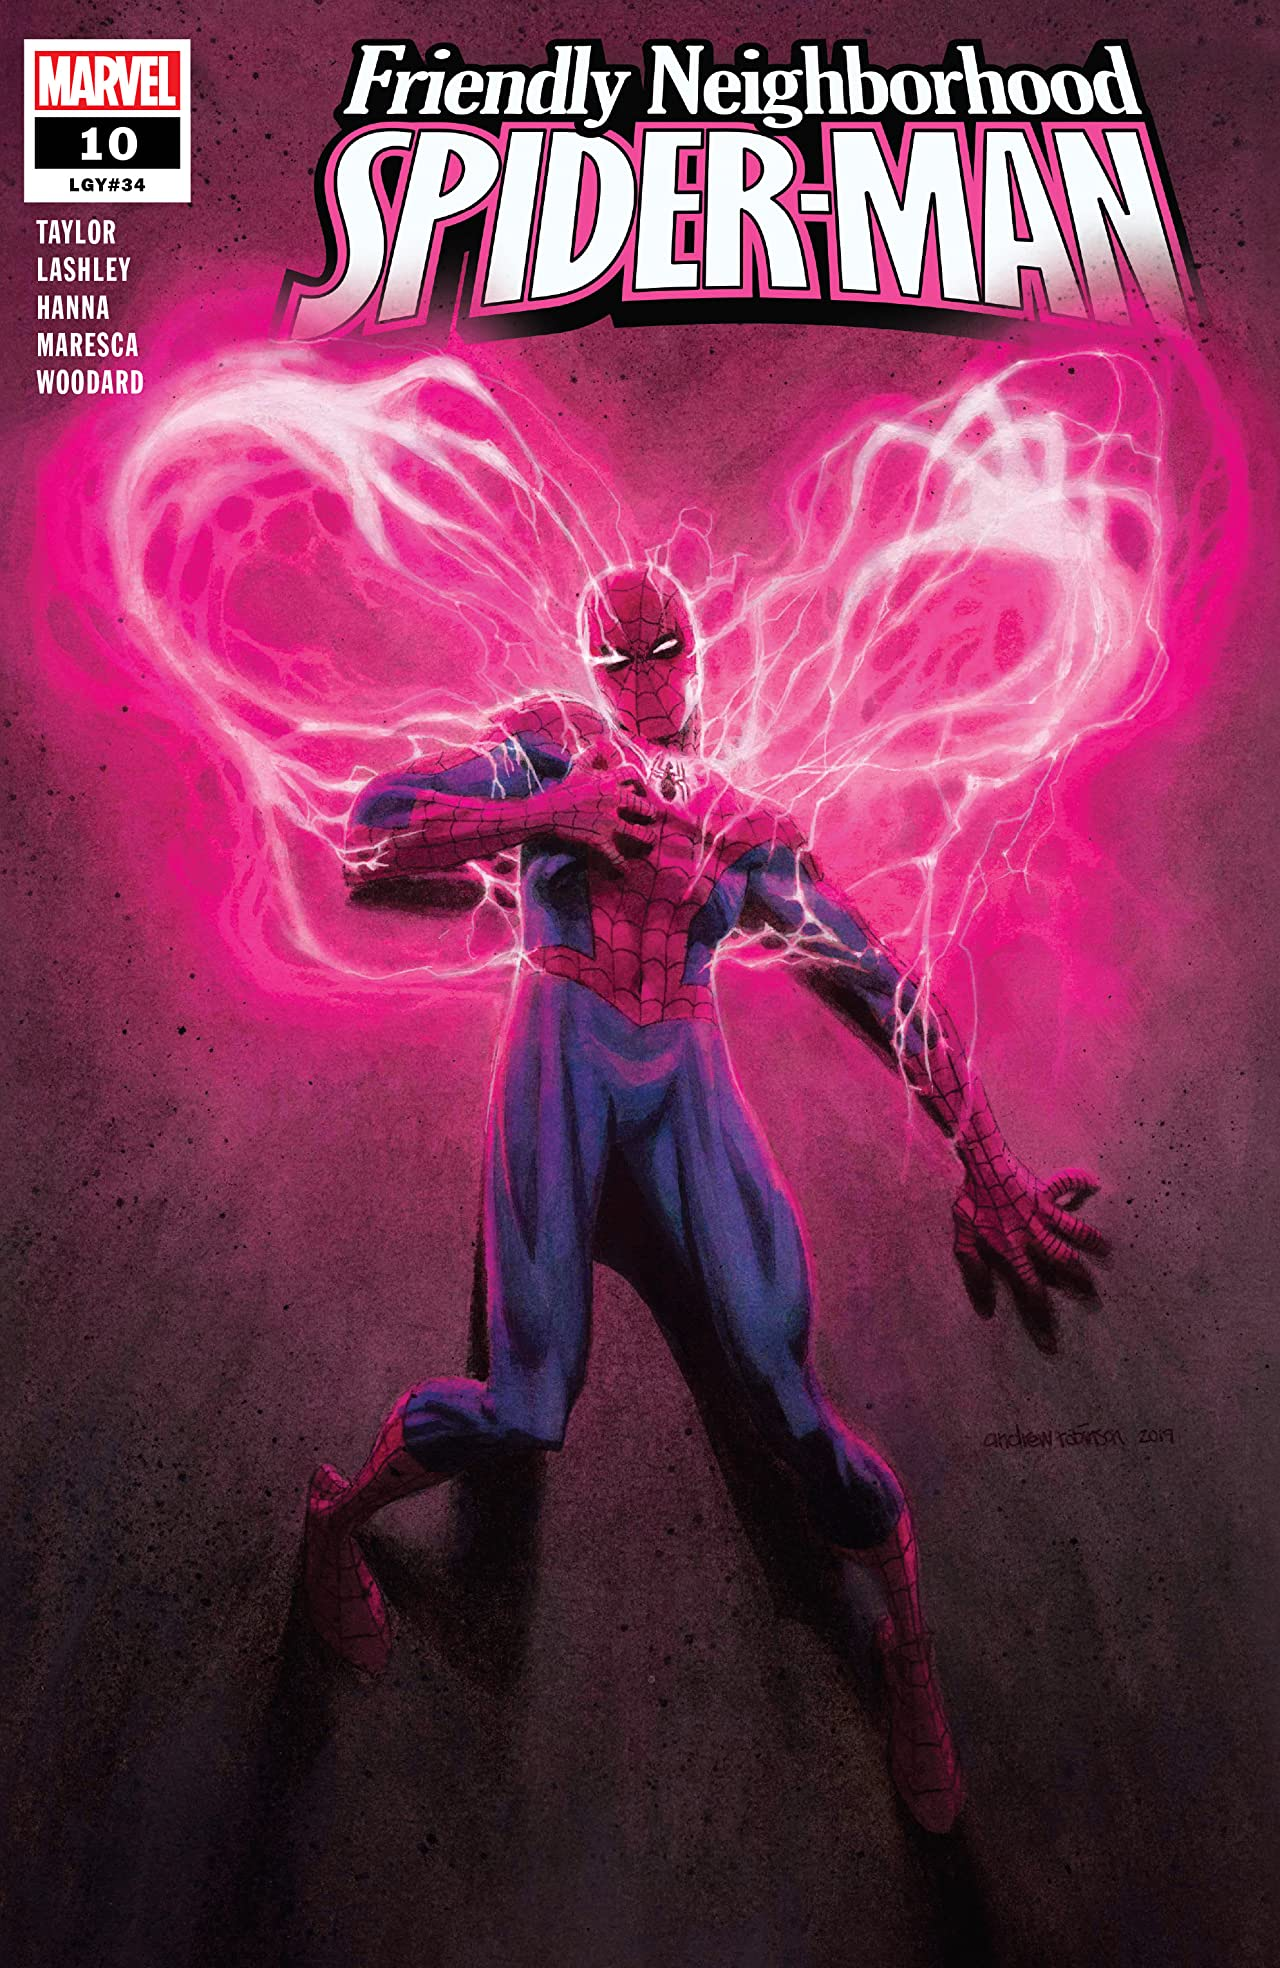 Friendly Neighborhood Spider-Man (2019-) No.10